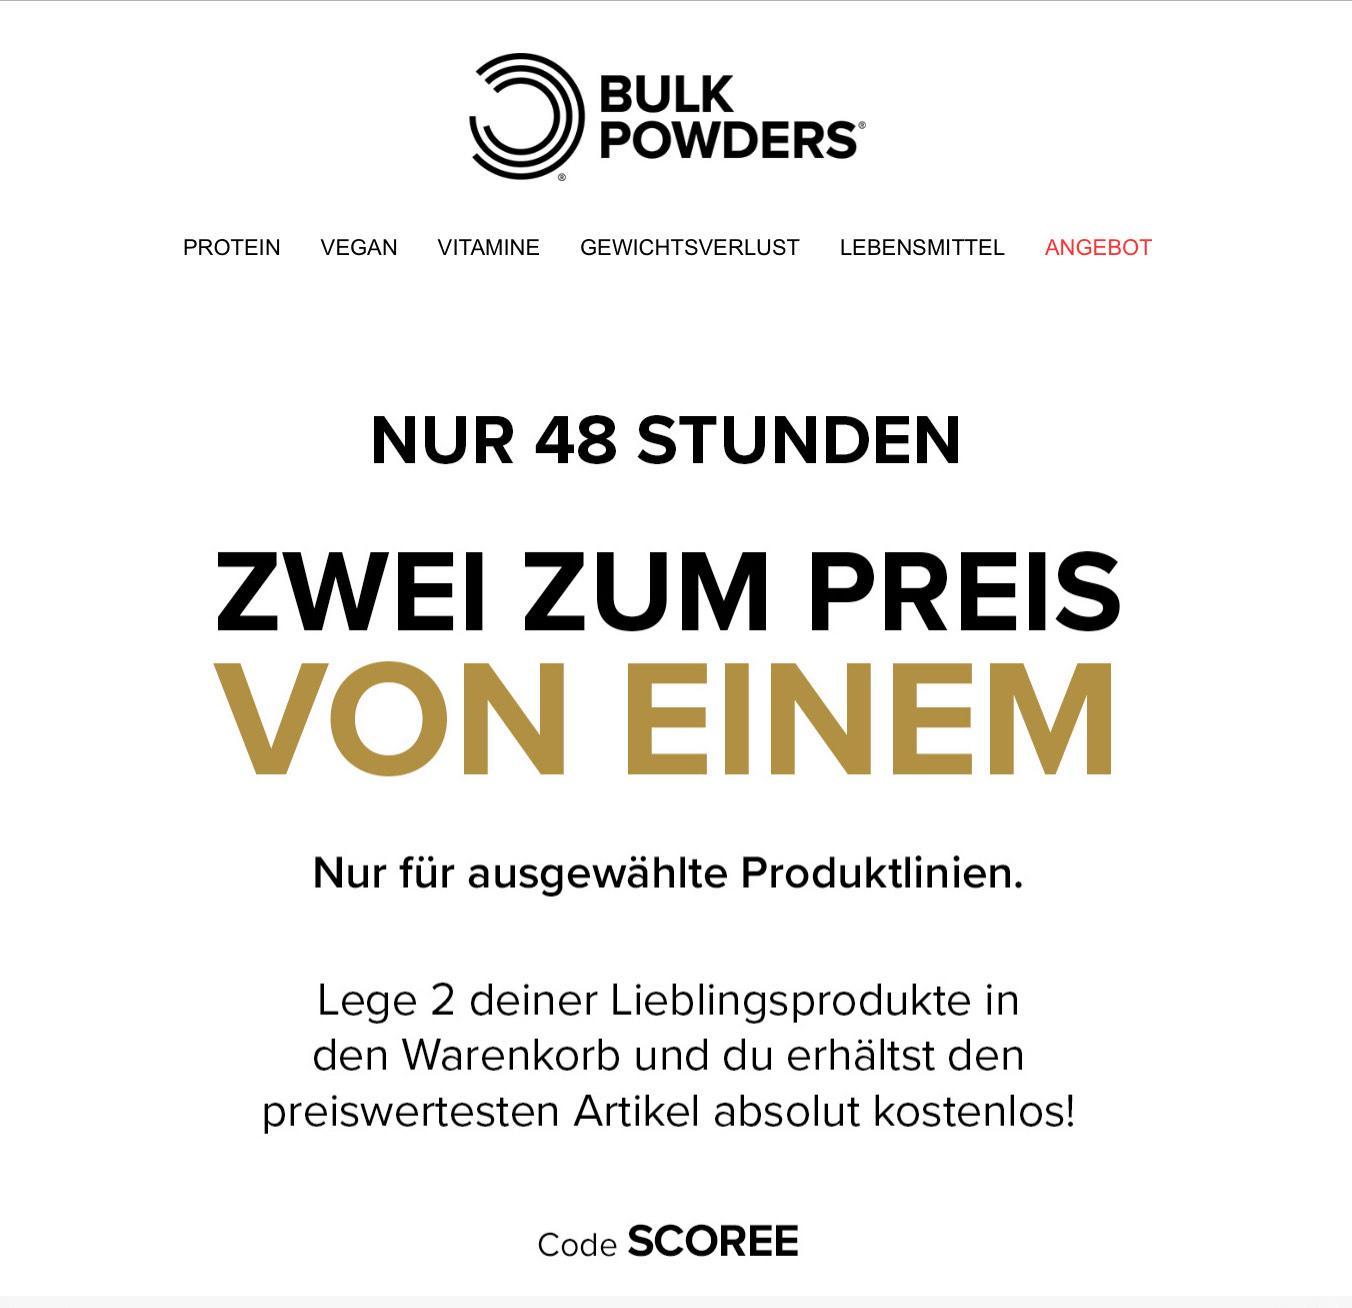 Bulk Powders Rabattaktion